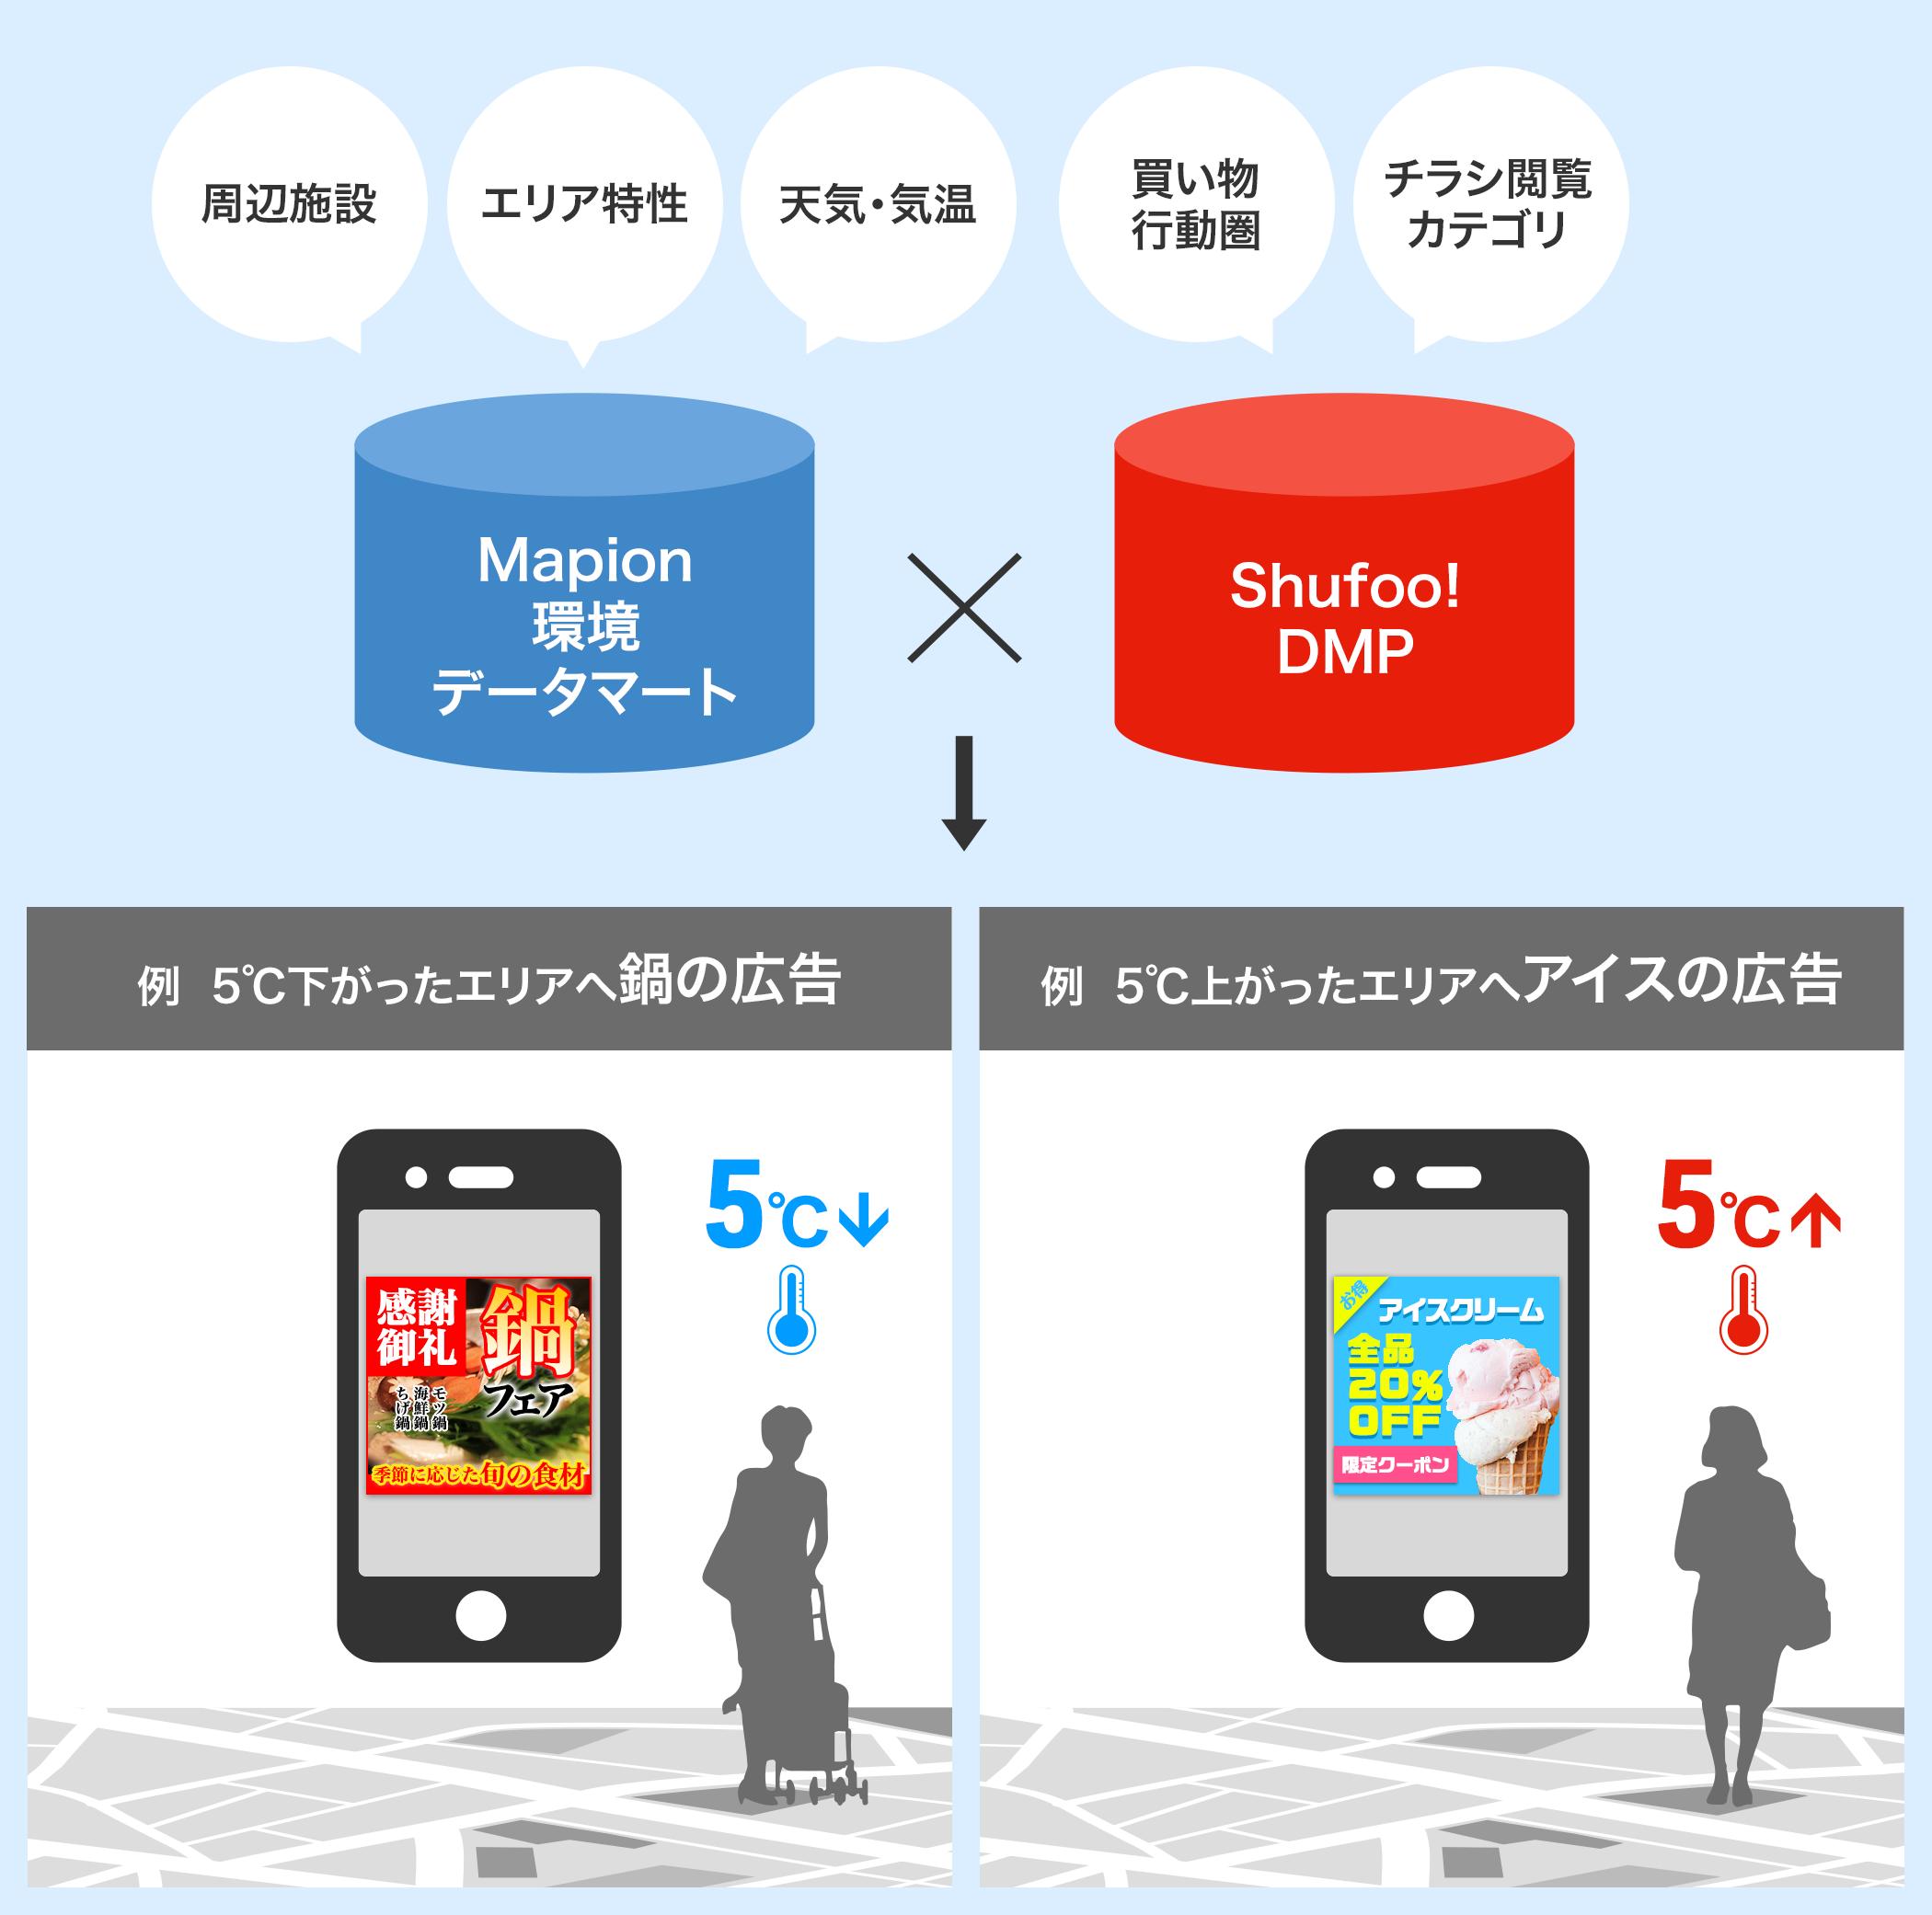 Shufoo! 気象ターゲティング広告サービス概要 (C) Toppan Printing Co., Ltd.